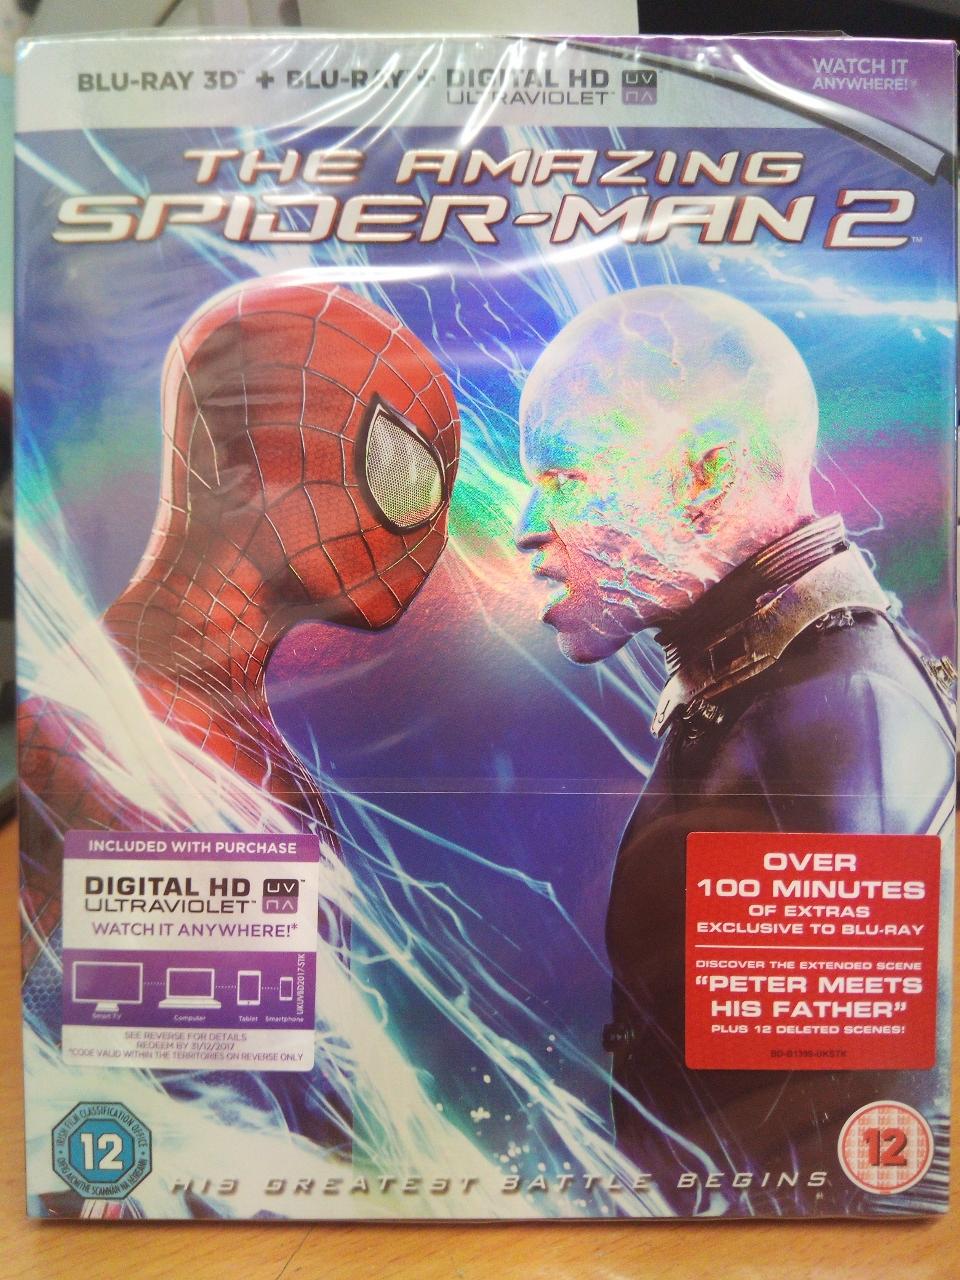 The Amazing Spiderman 2 Blu Ray 3D + Blu Ray + U/V Digital Copy £1 in store @ Poundland